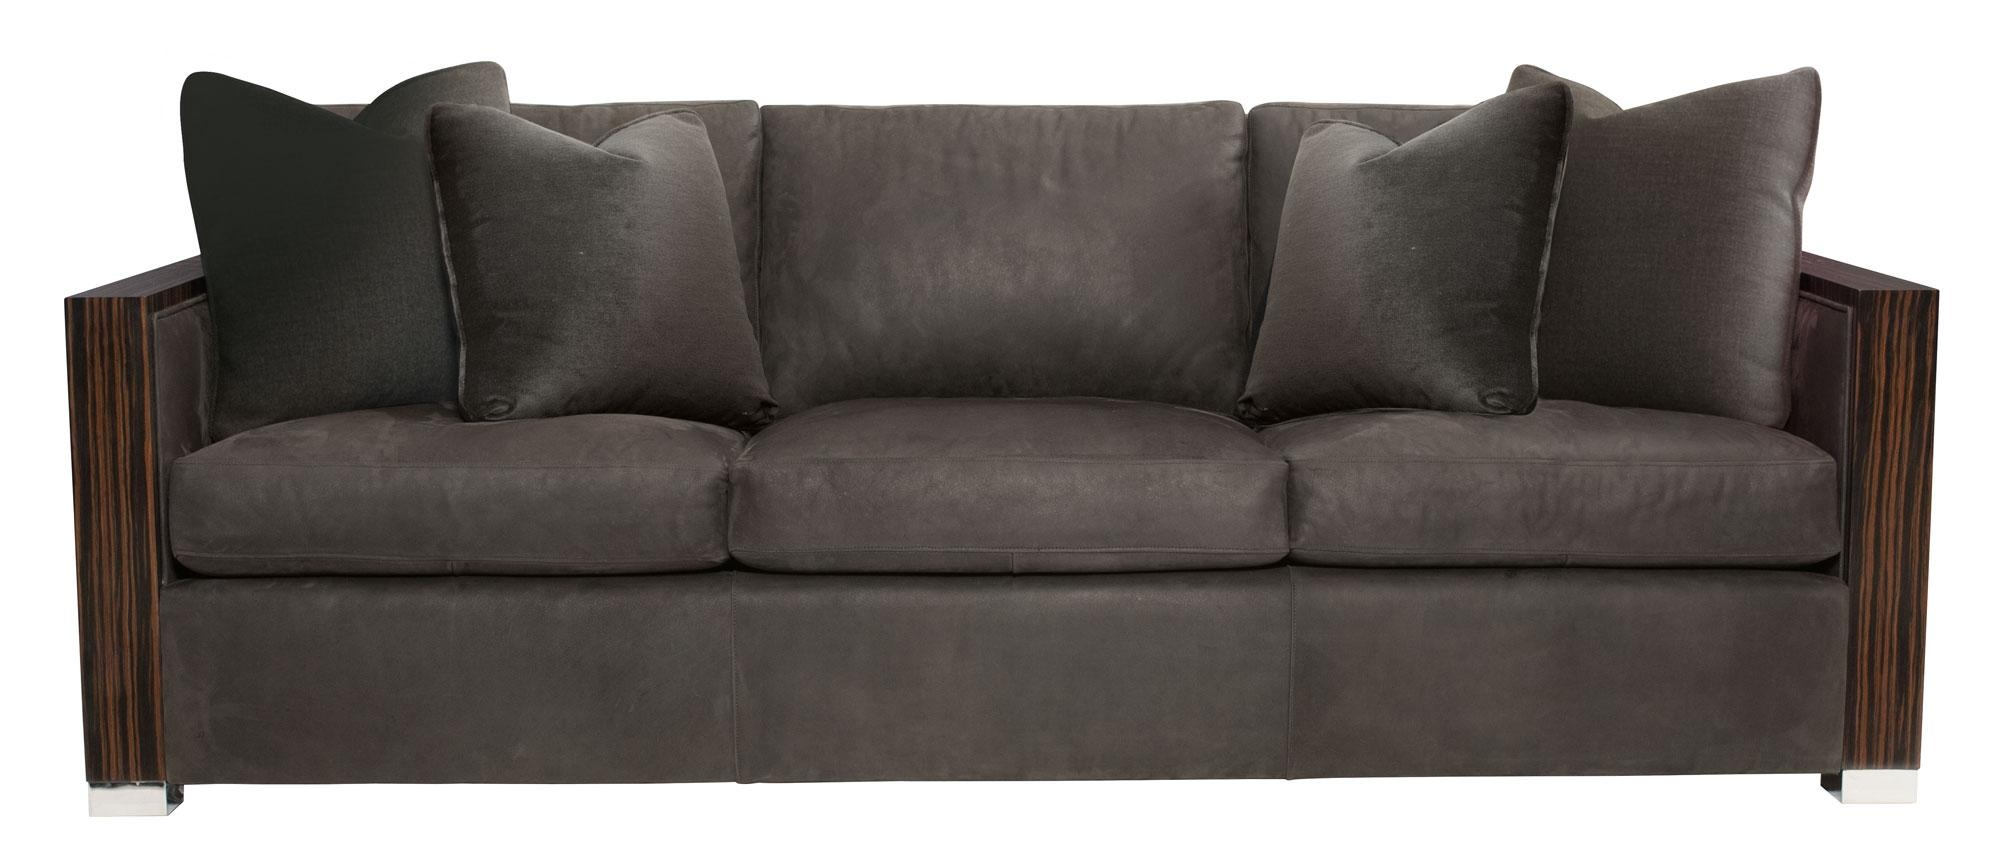 Bernhardt Tarleton Sofa With Ideas Design 25417 | Kengire Throughout Bernhardt Tarleton Sofas (View 9 of 20)